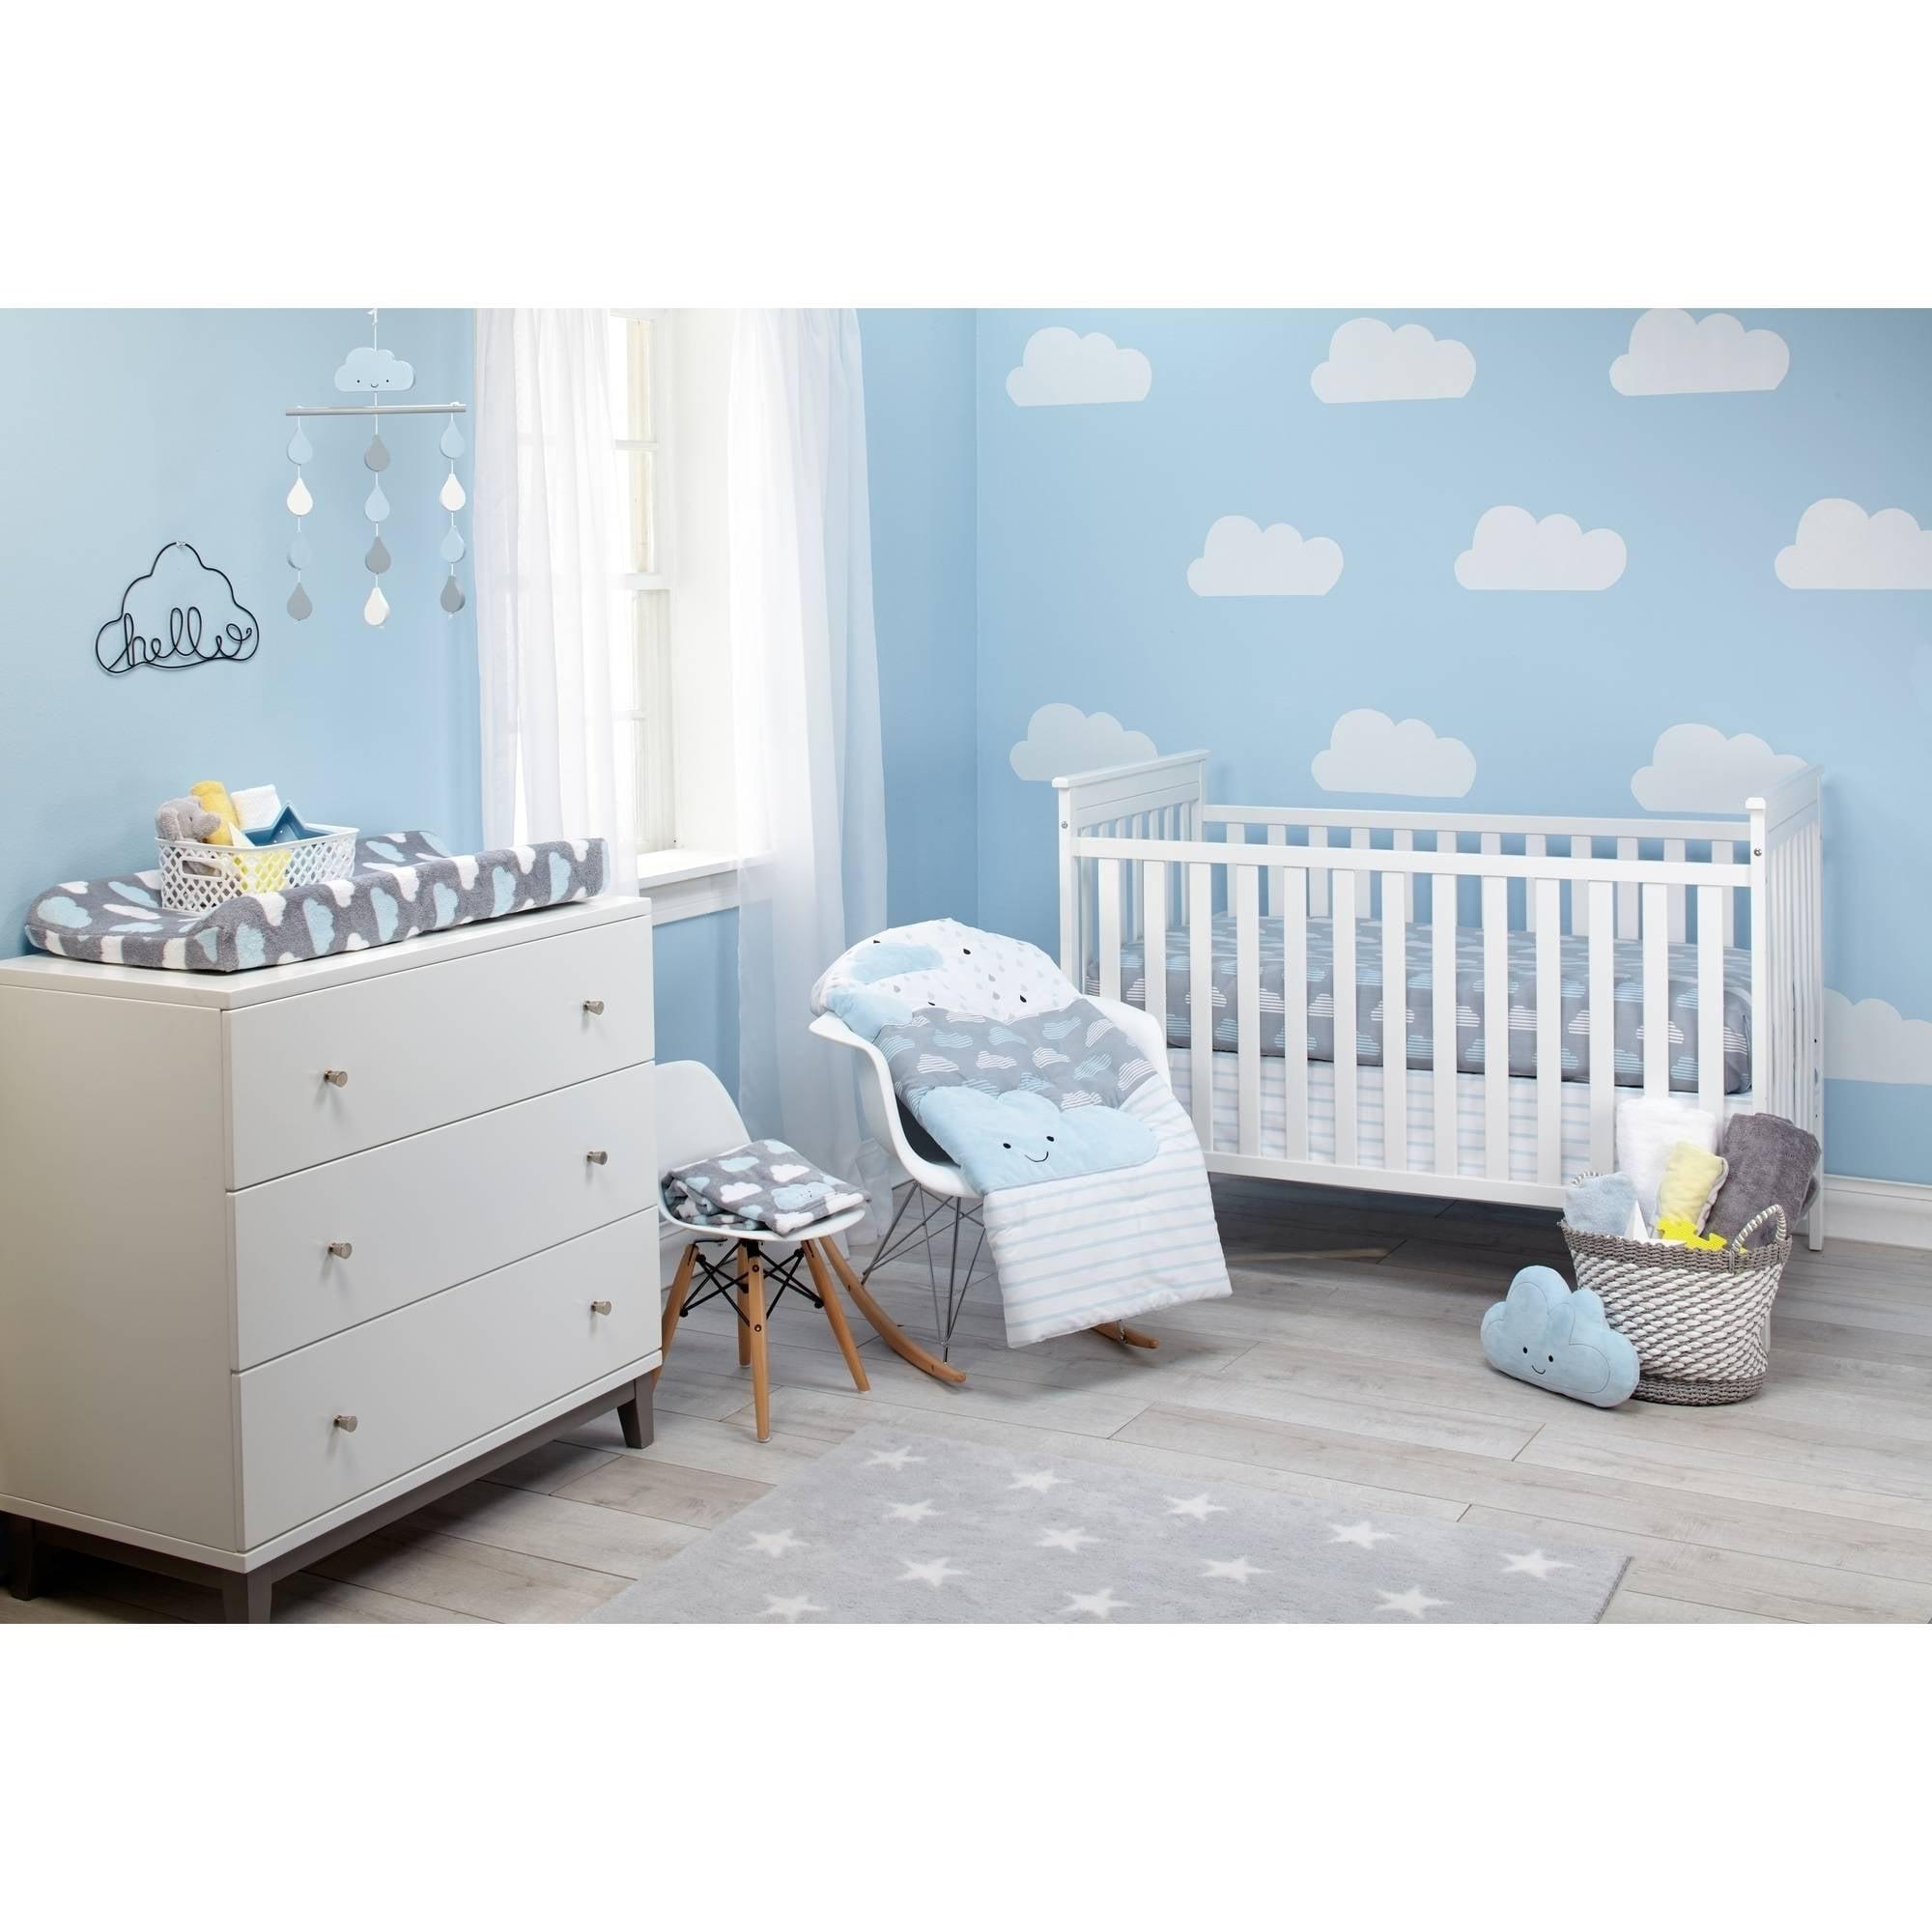 Little Love Happy Clouds 5pc Crib Set